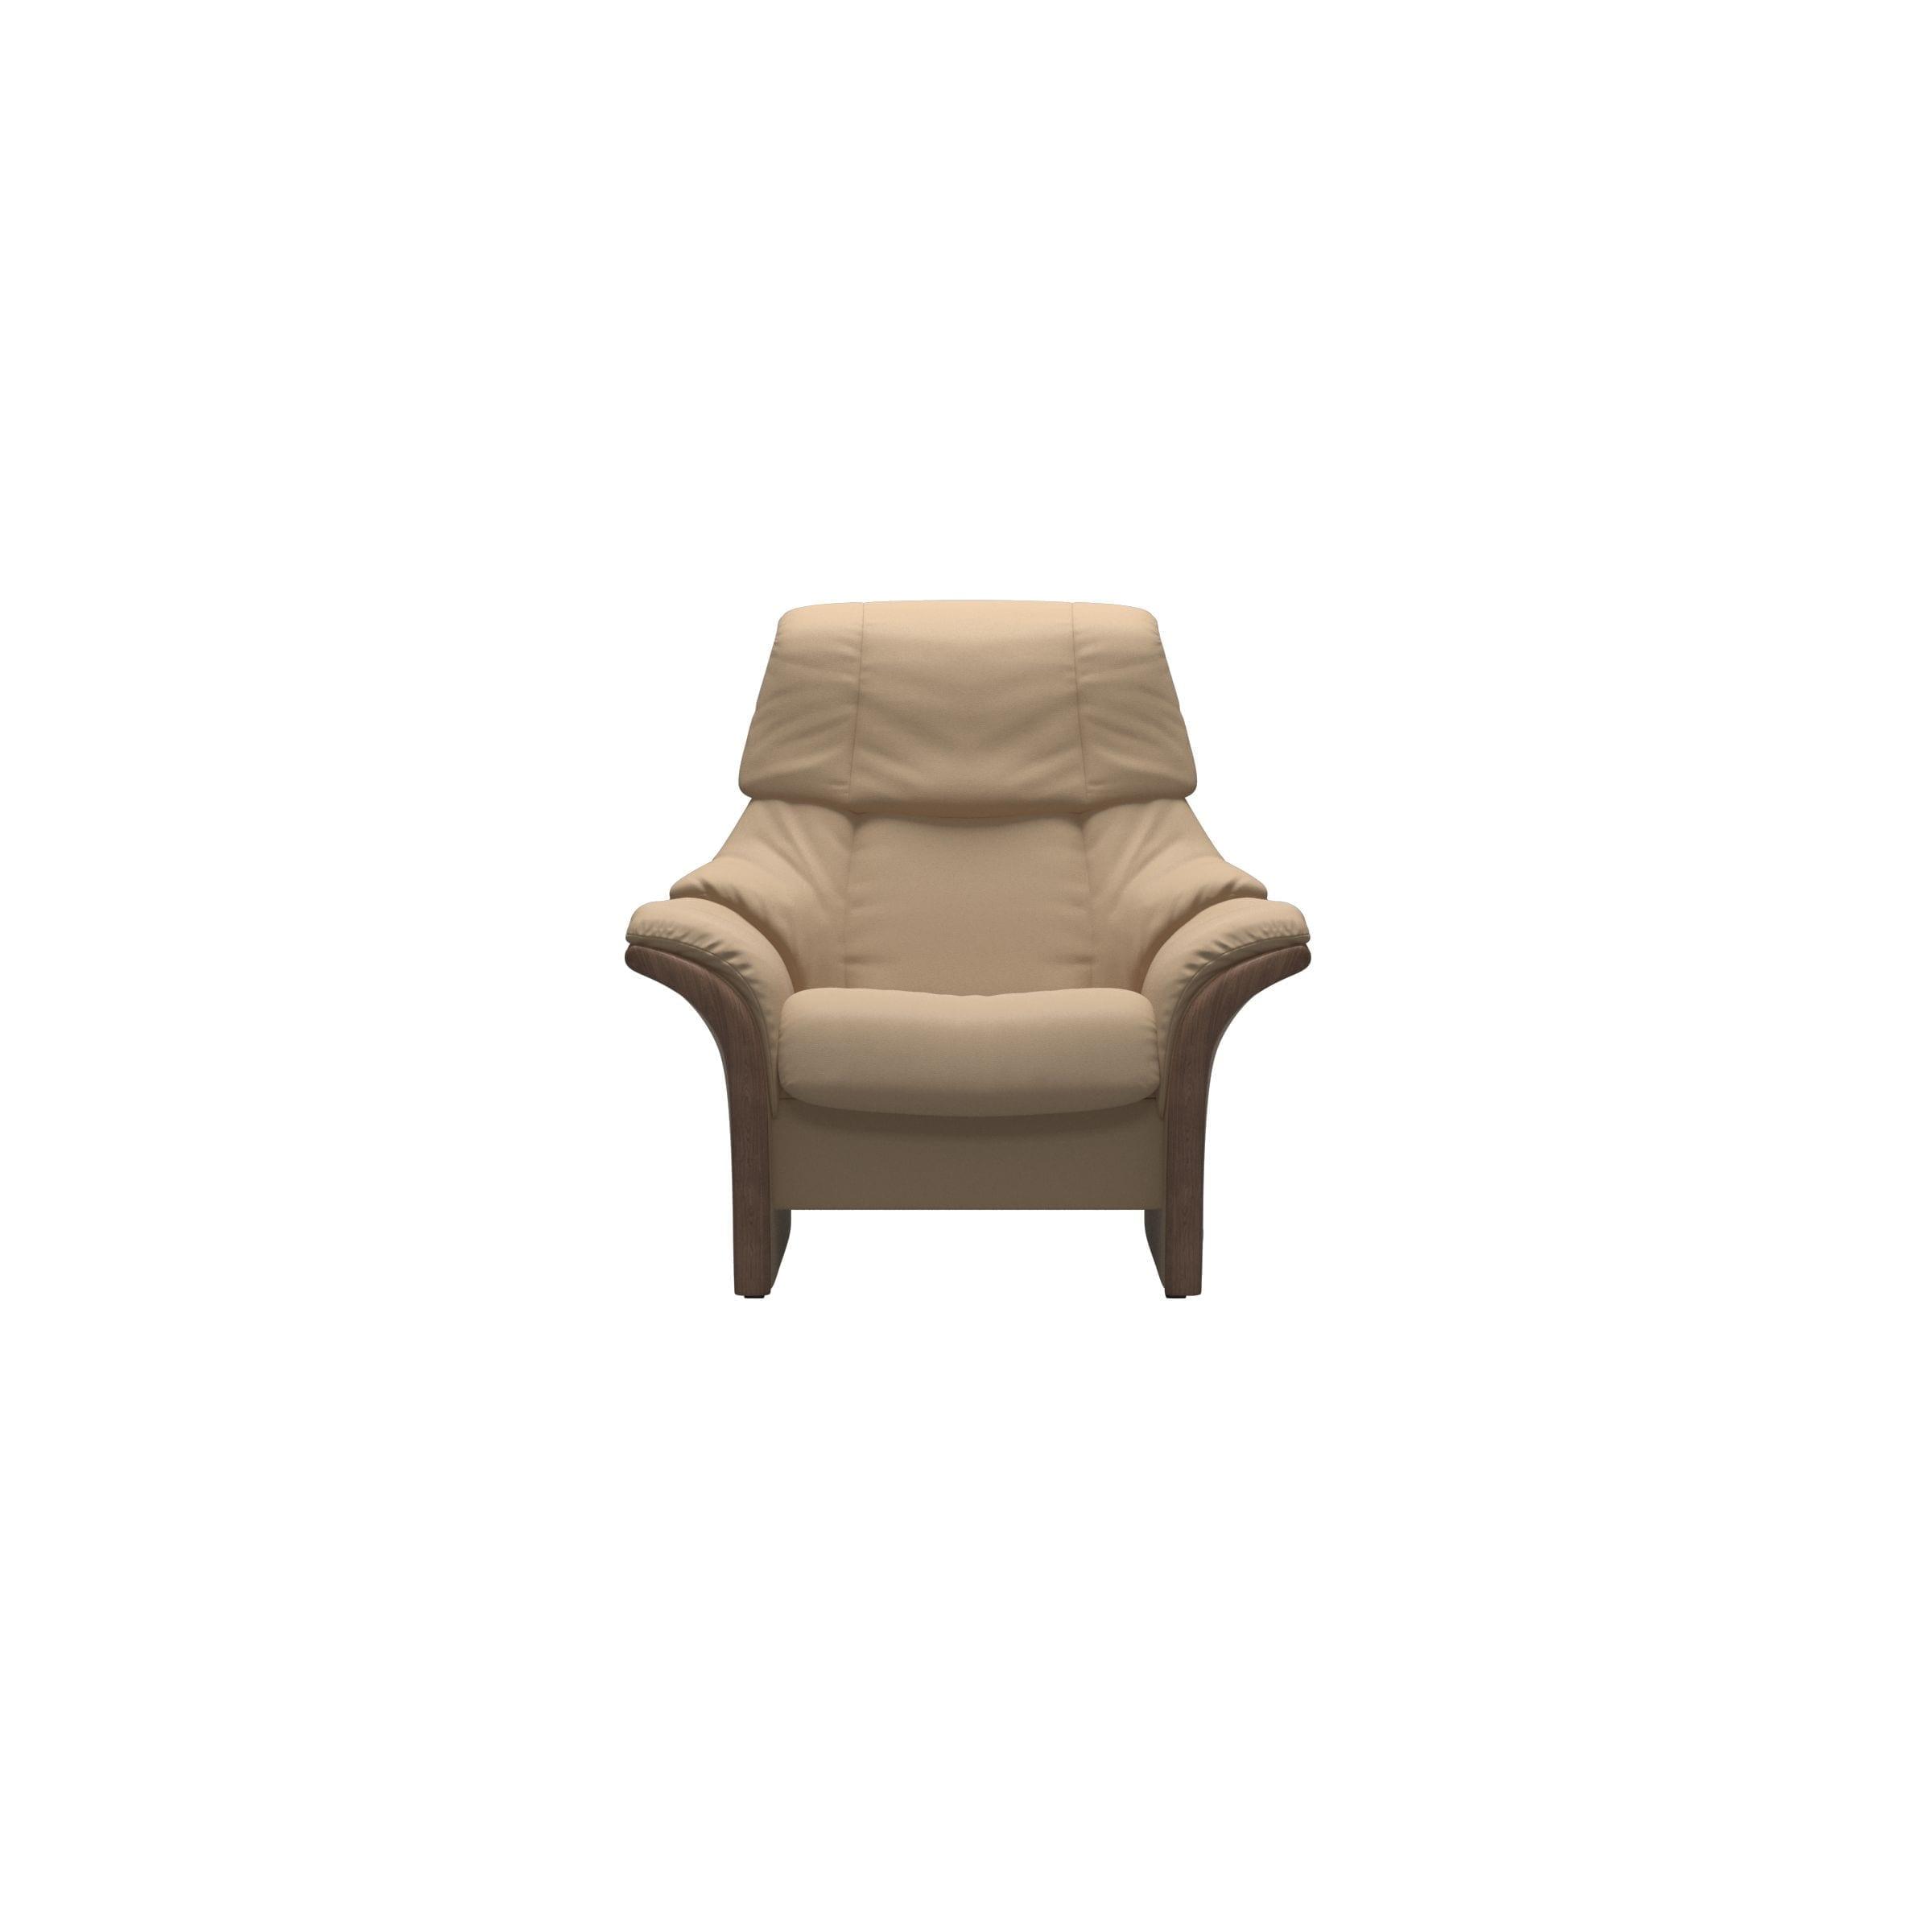 Eldorado High Back Chair Stressless